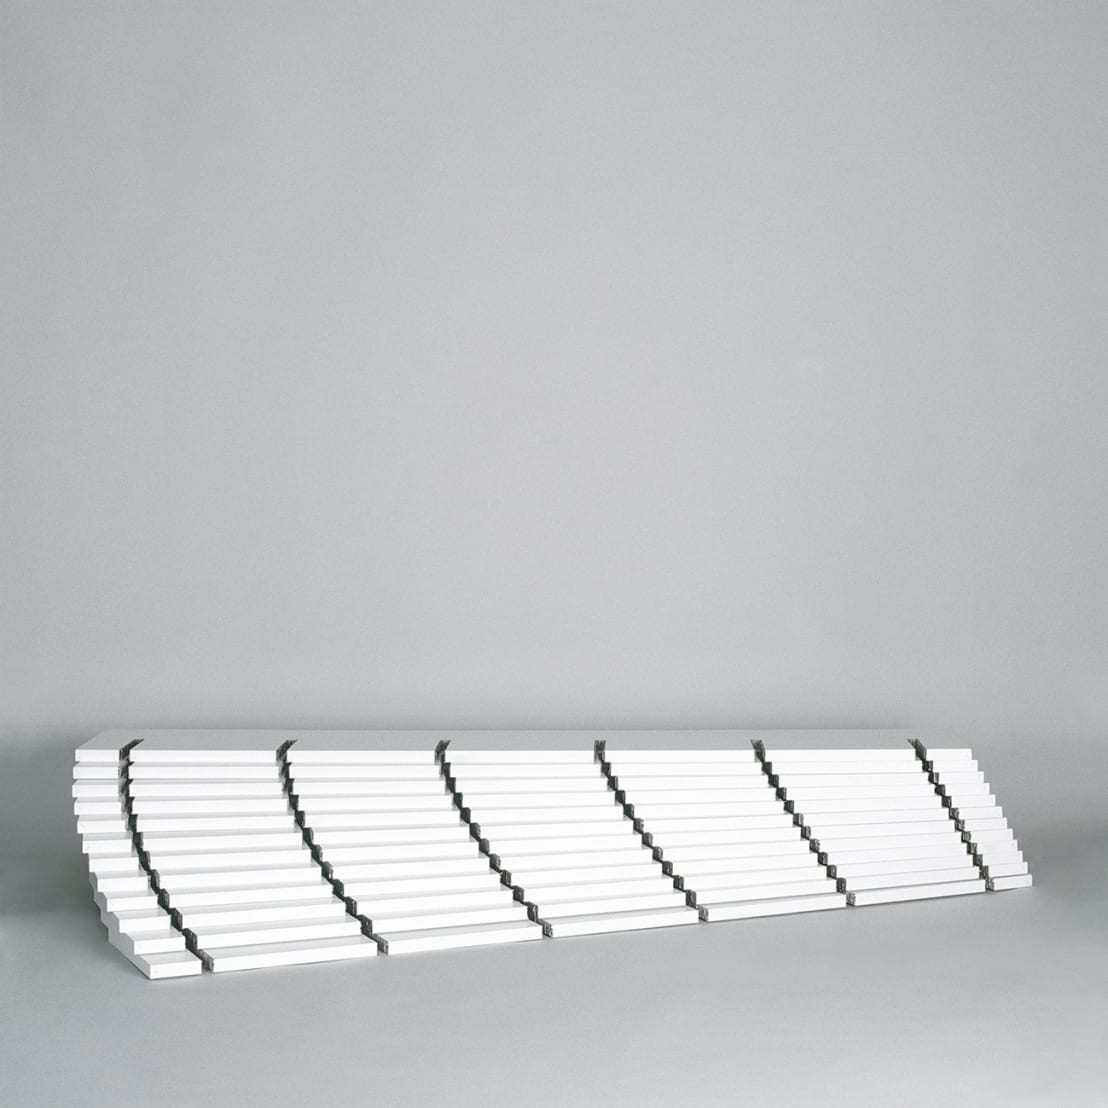 pappregal aus papier wabenplatten de frank huster homify. Black Bedroom Furniture Sets. Home Design Ideas